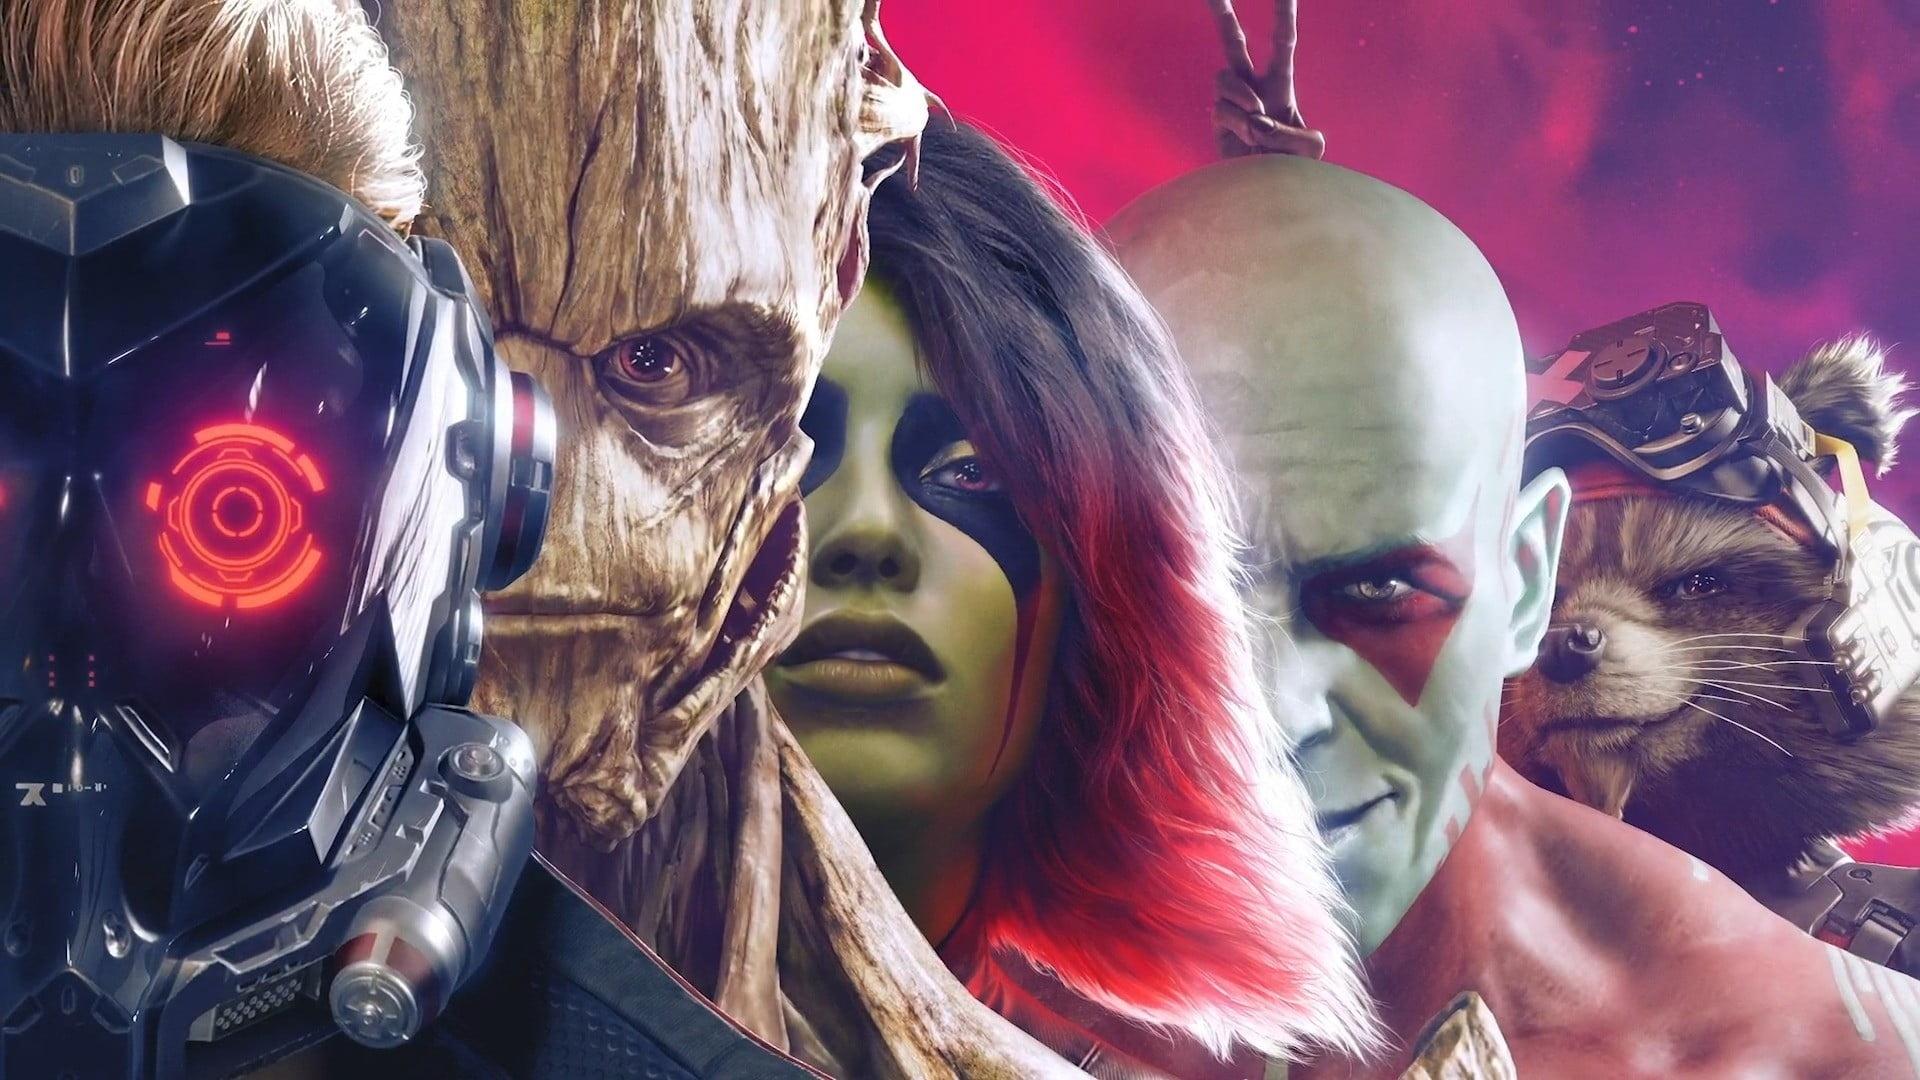 Wieso Guardians of the Galaxy uns beim Anspielen überrascht hat